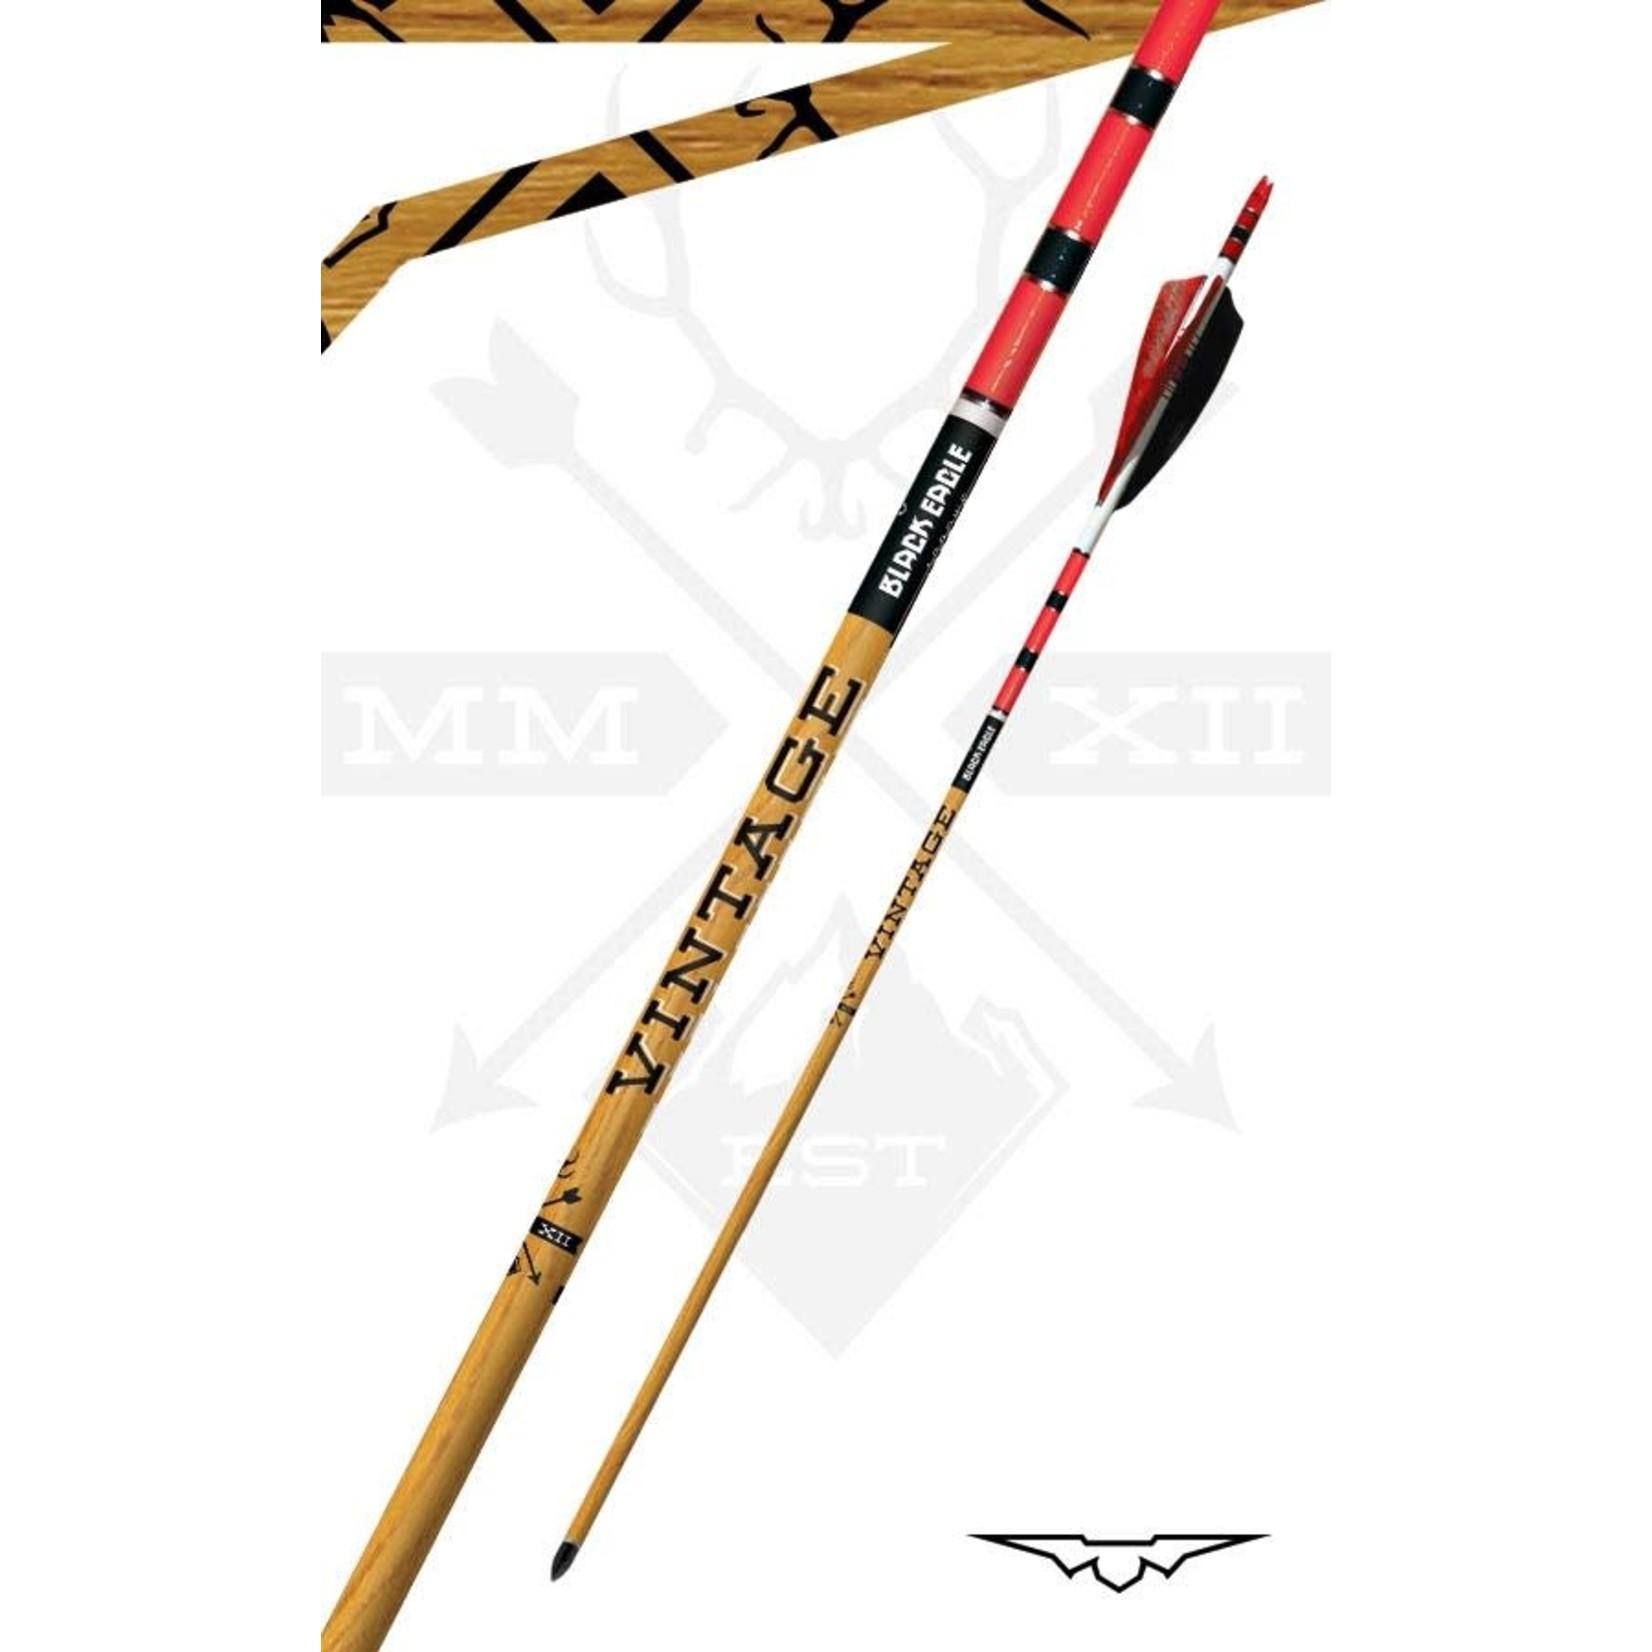 Black Eagle Black Eagle Vintage Crested Feathered Arrows 600 .003 (6 Pk)